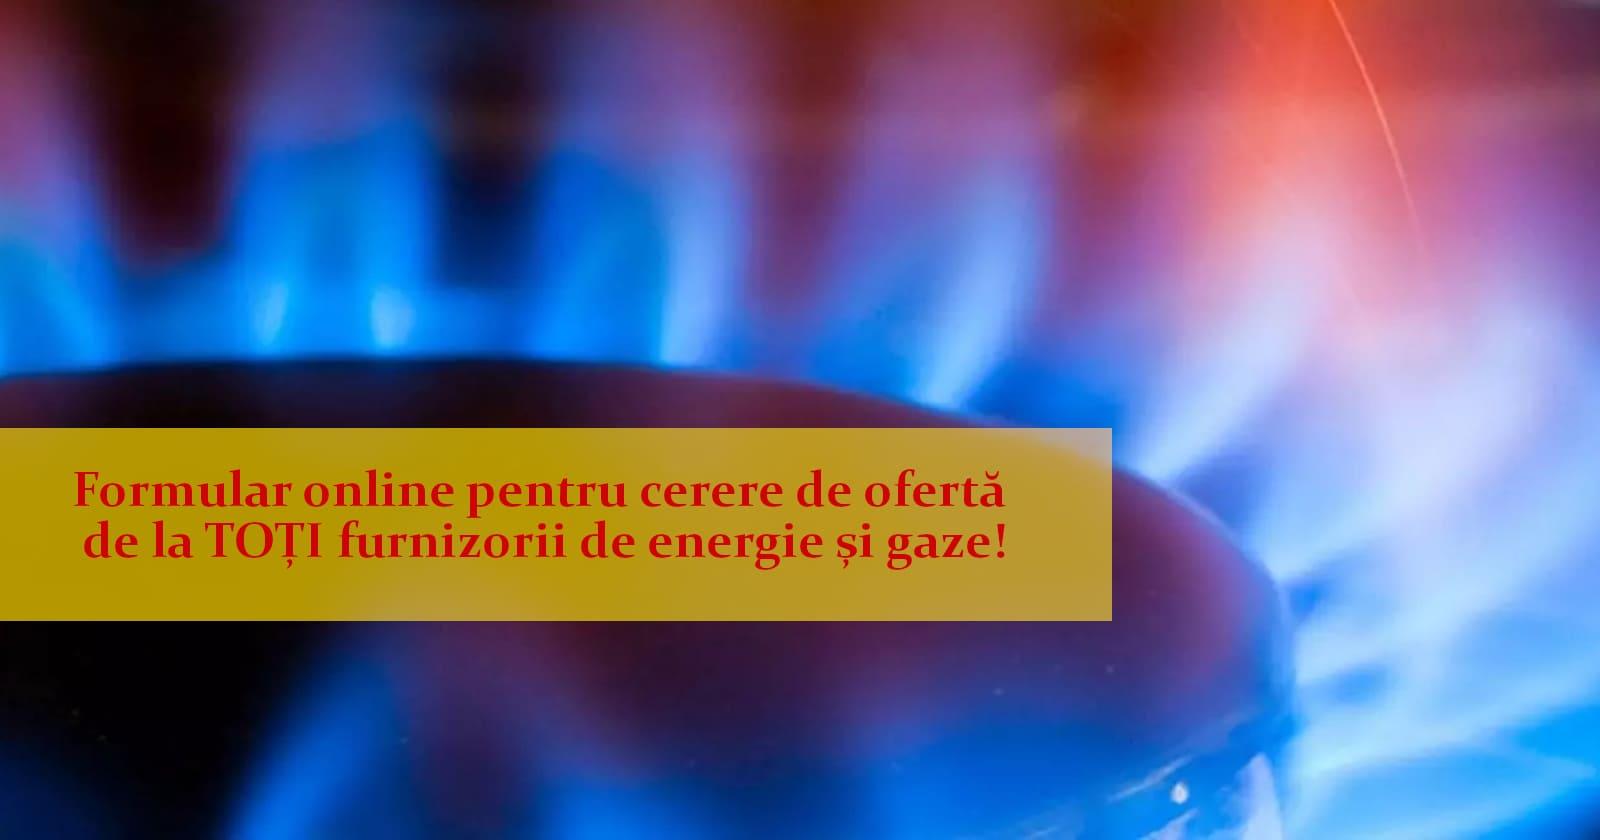 https://ziarul.romania-rationala.ro/control/articole/articole/formular-cerere-oferta-de-pret-energie-electrica-si-gaze-naturale.jpg